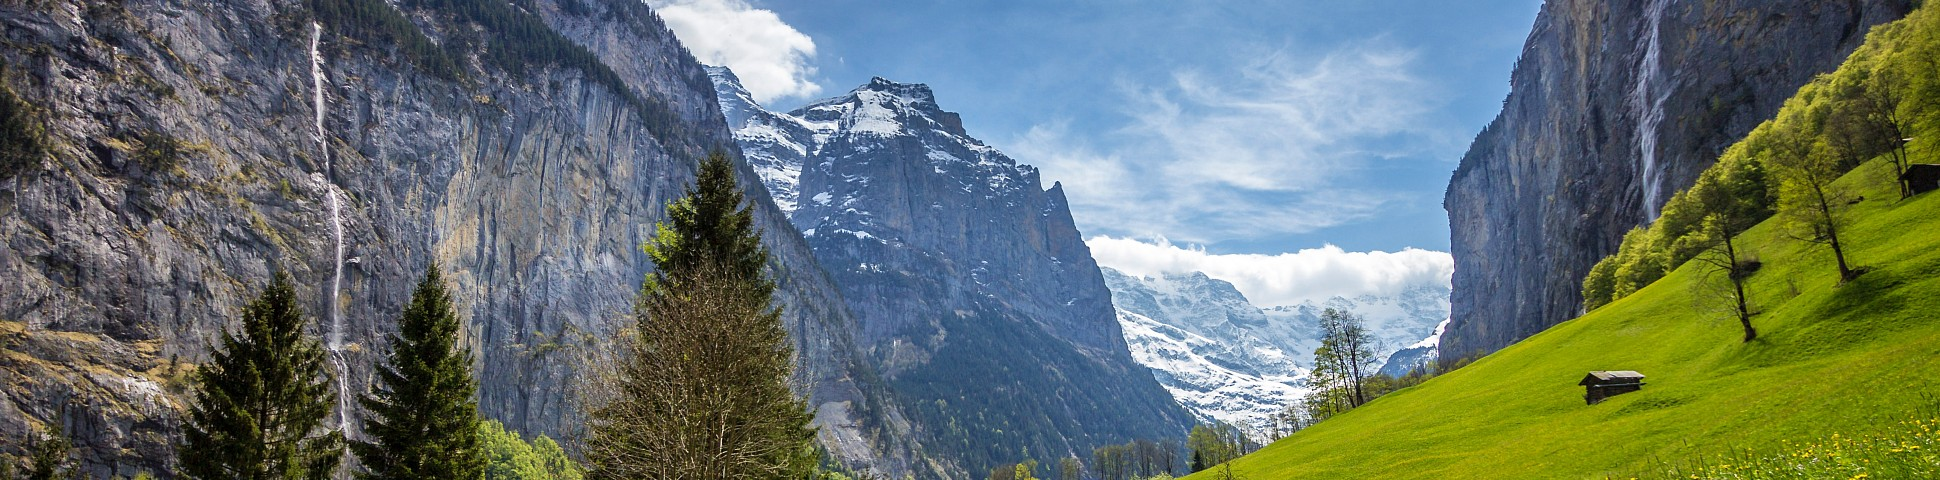 Swiss Alps in Switzerland